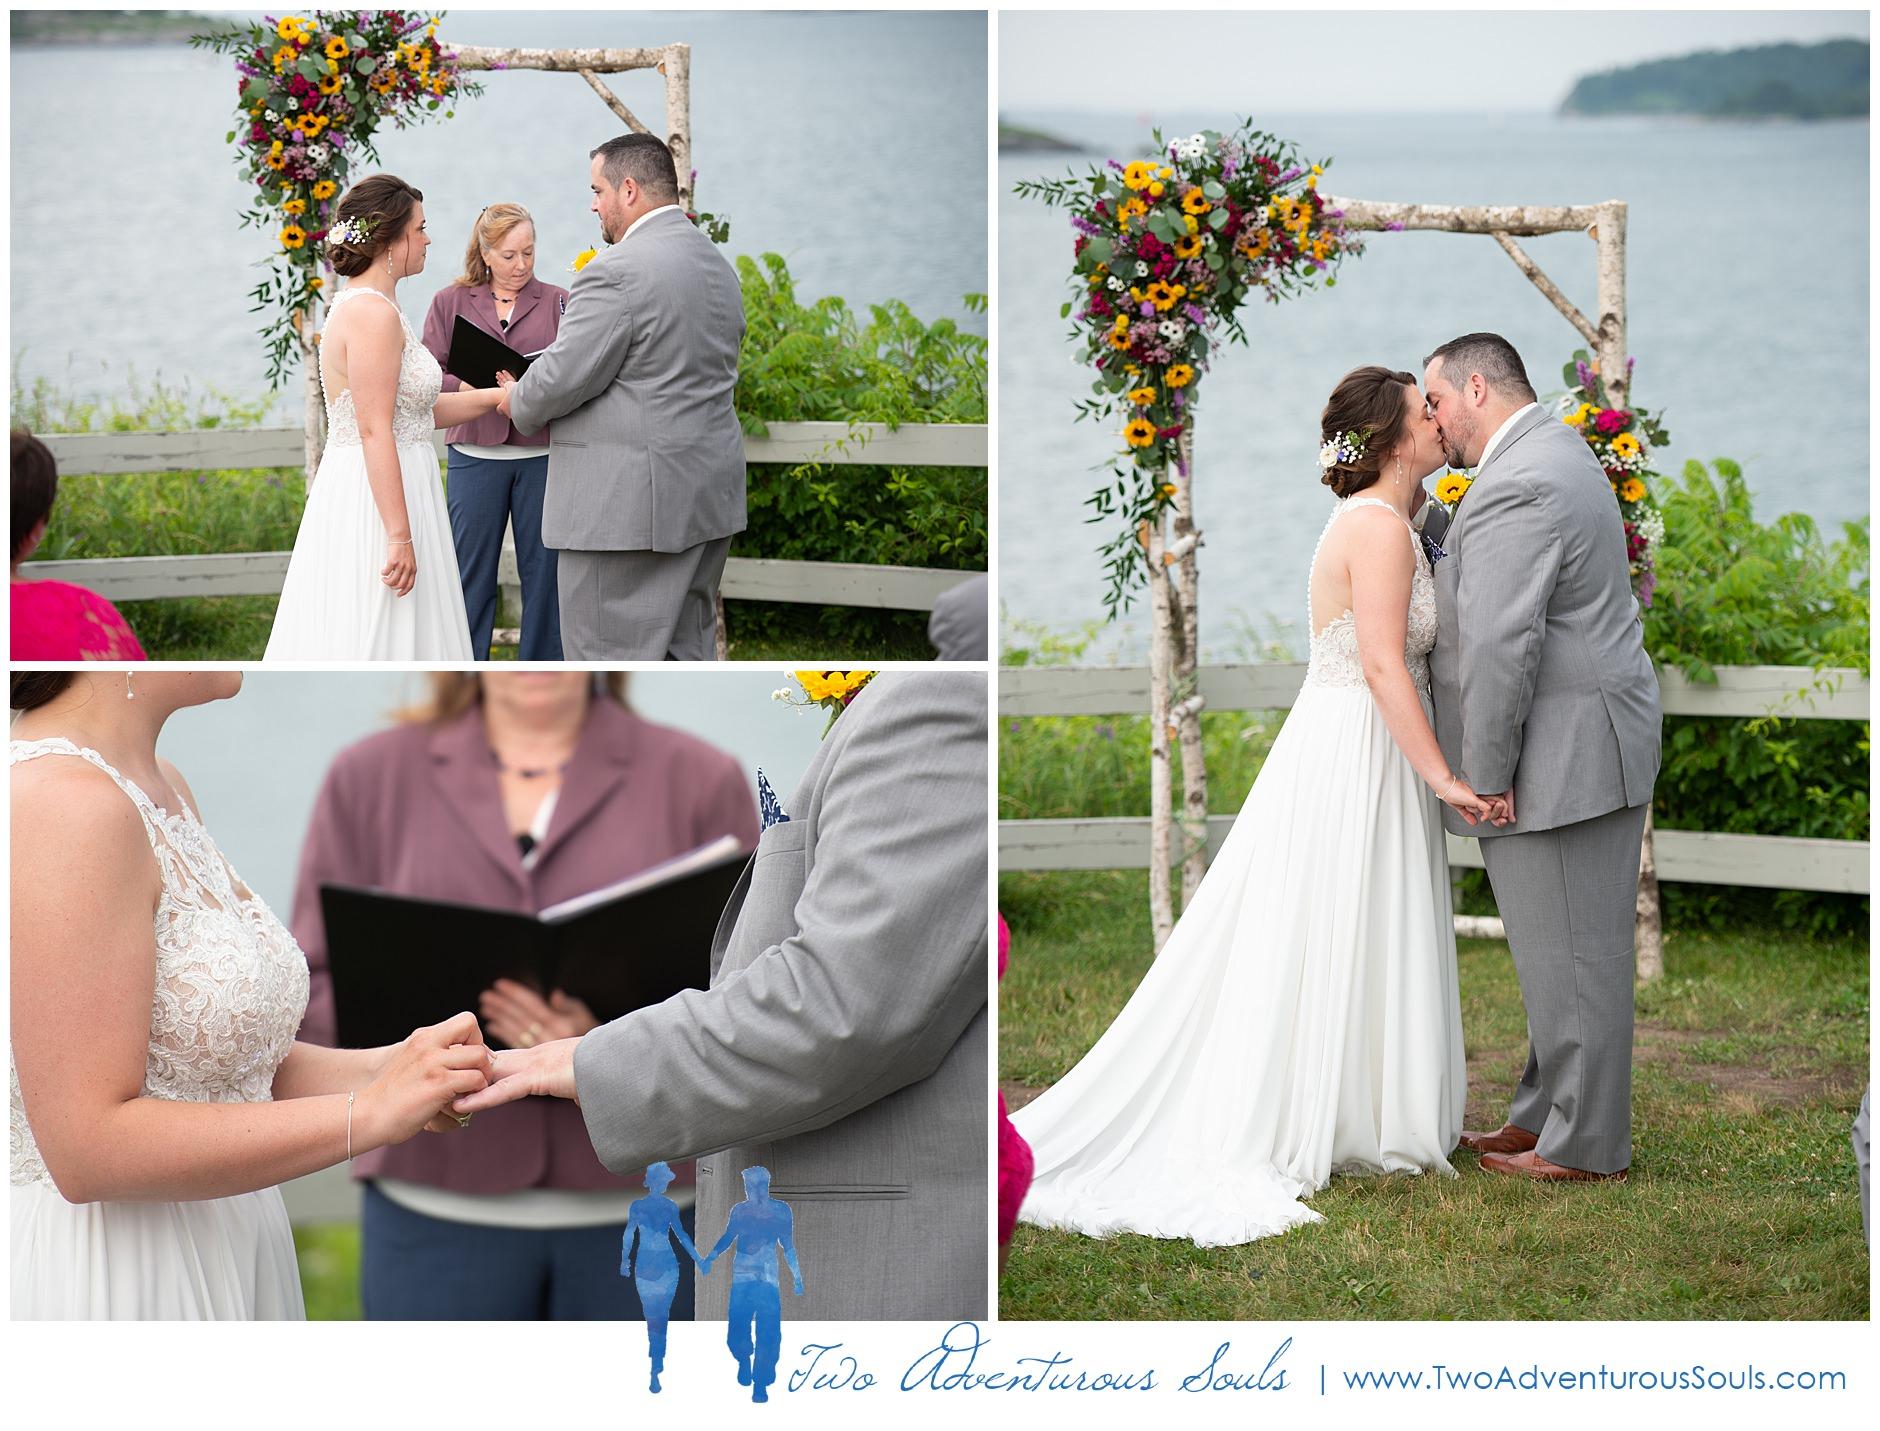 Maine Wedding Photographers, SMCC Wedding Photographers, Southern Maine Community College Wedding Photographers, Two Adventurous Souls-AshleyAaron_0029.jpg